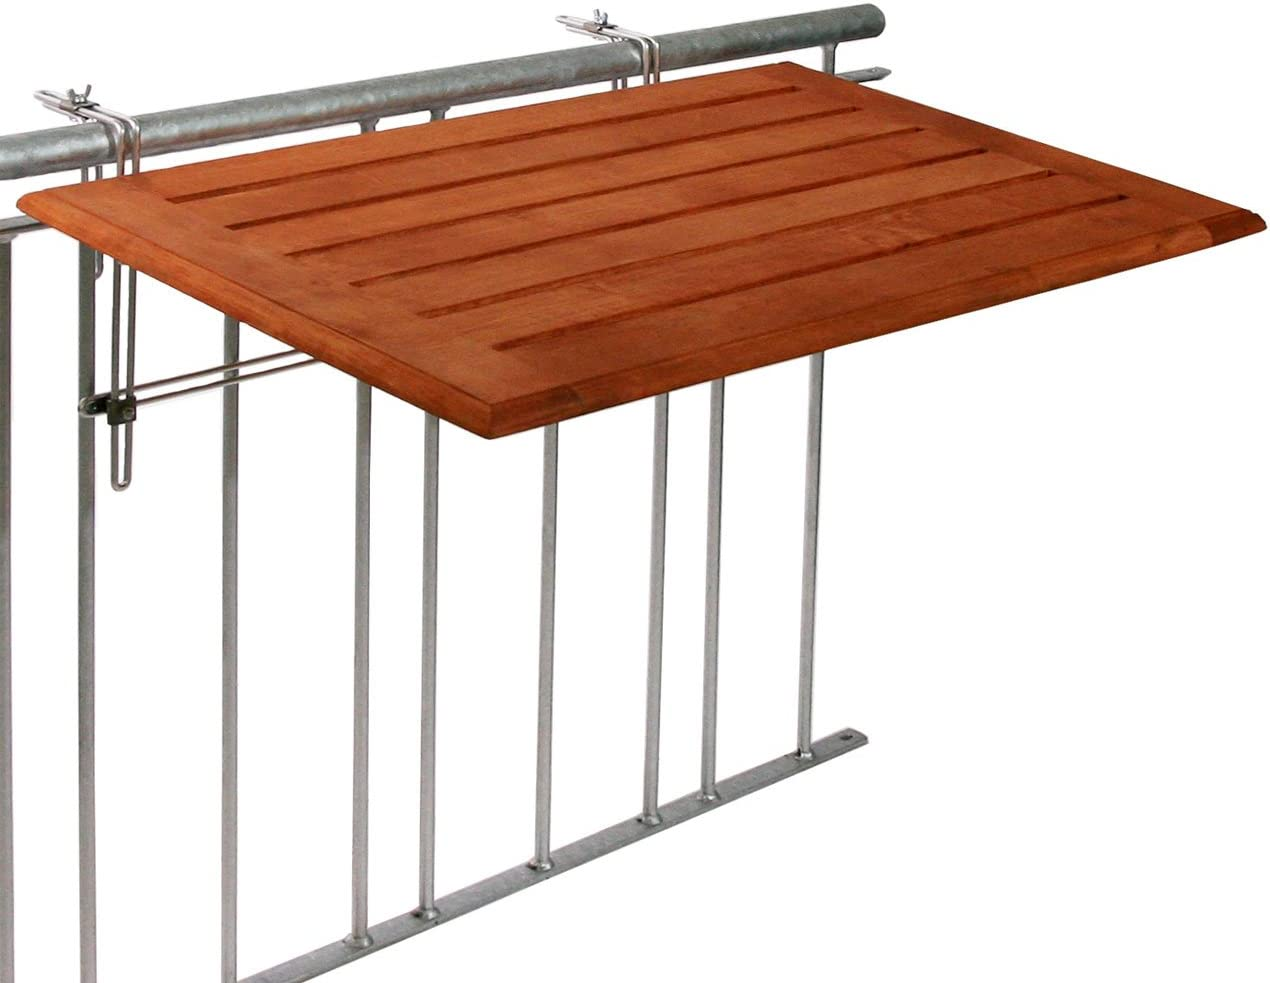 Videx – Mesa plegable de terraza, madera de bambú, 50 x 100 cm: Amazon.es: Jardín